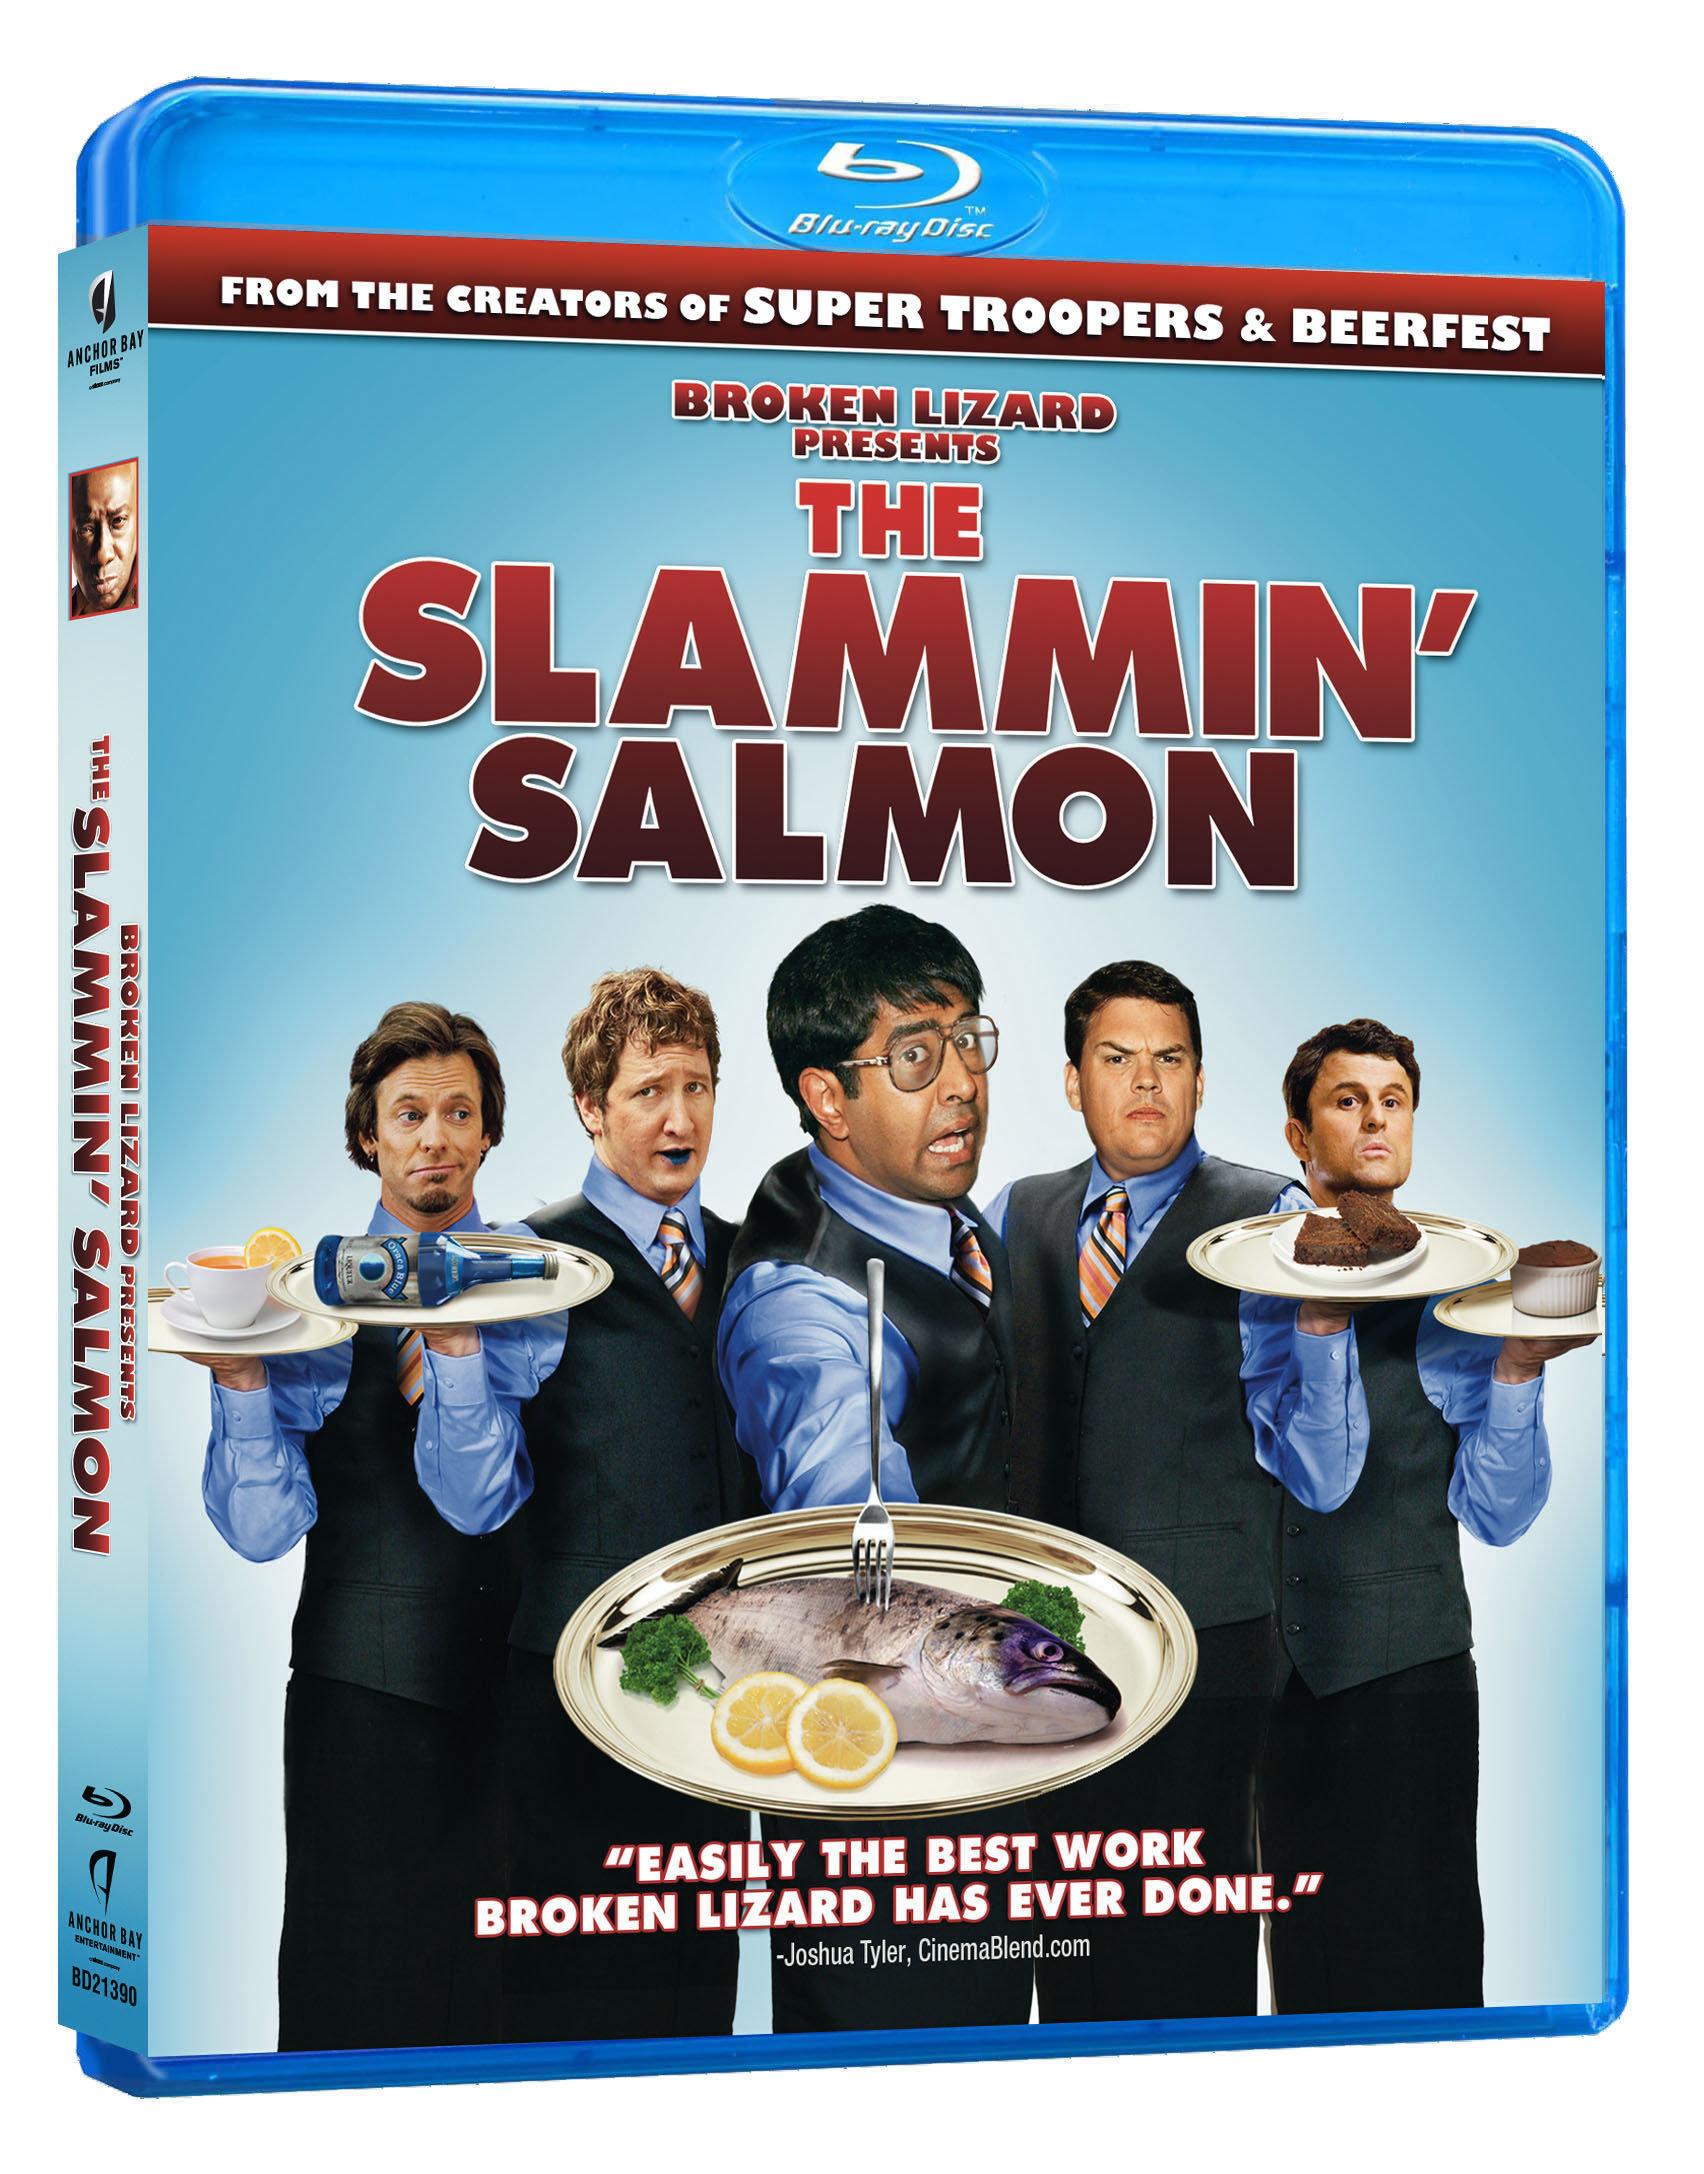 Скачать Верзила Салмон / The Slammin' Salmon (2009/BDRip/720p